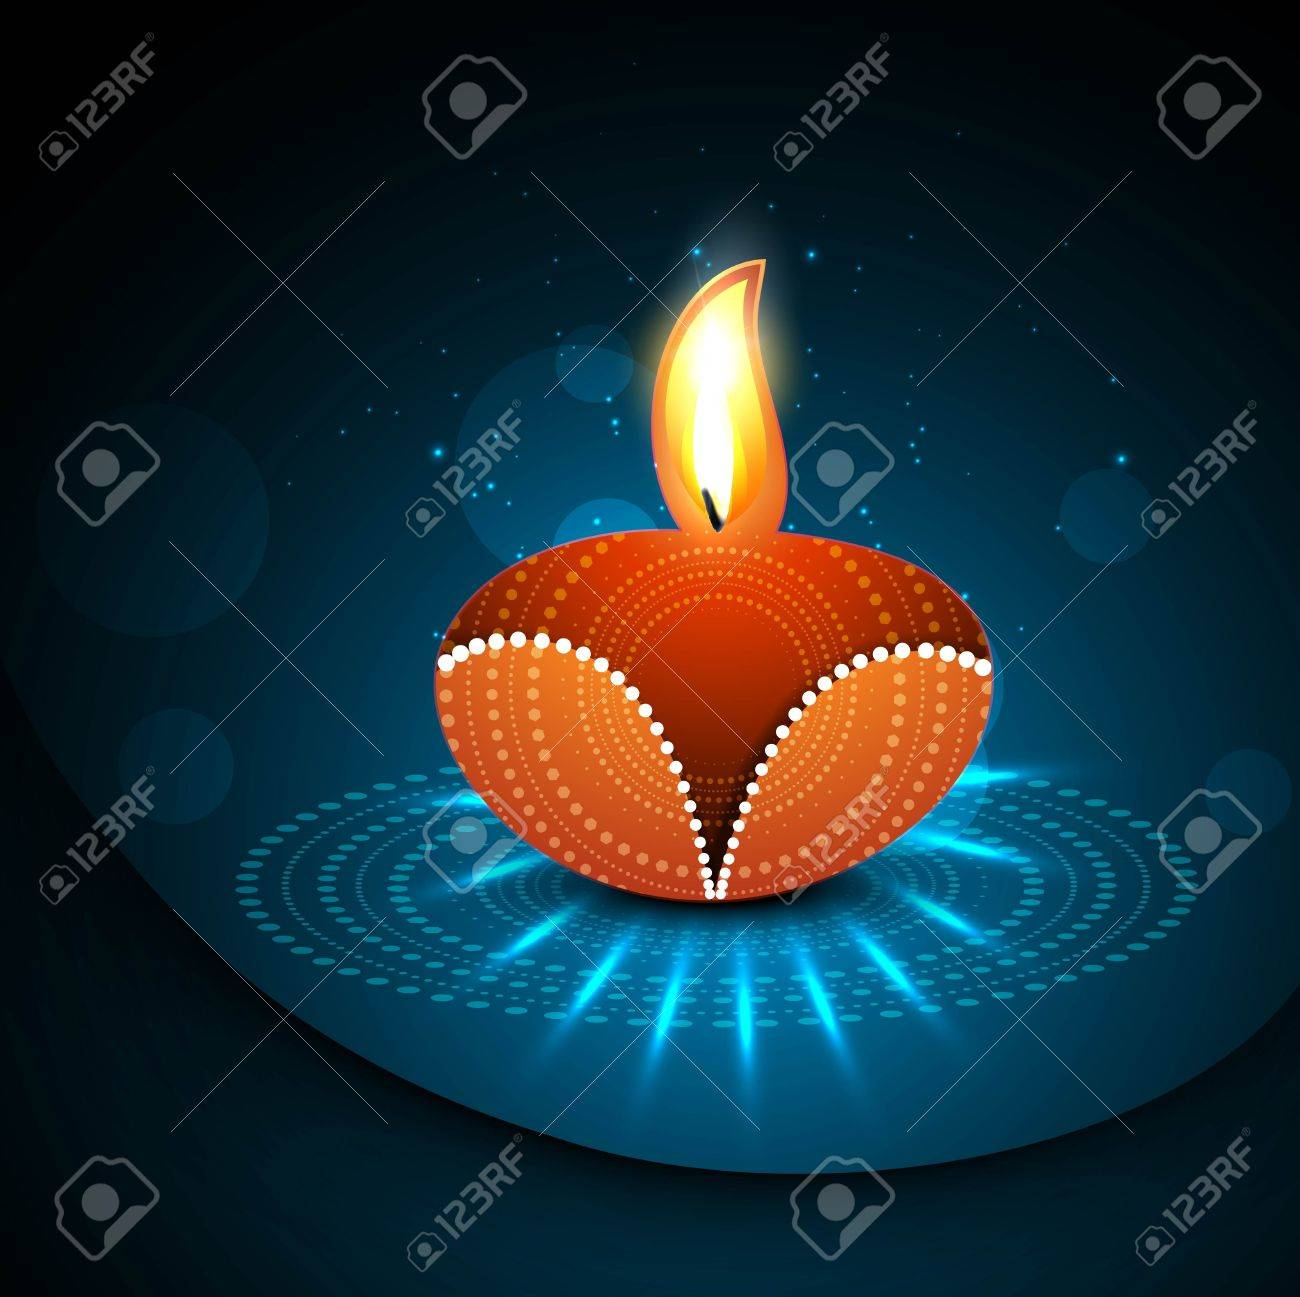 Happy diwali diya celebration shiny colorful hindu festival vector illustration Stock Vector - 18435889